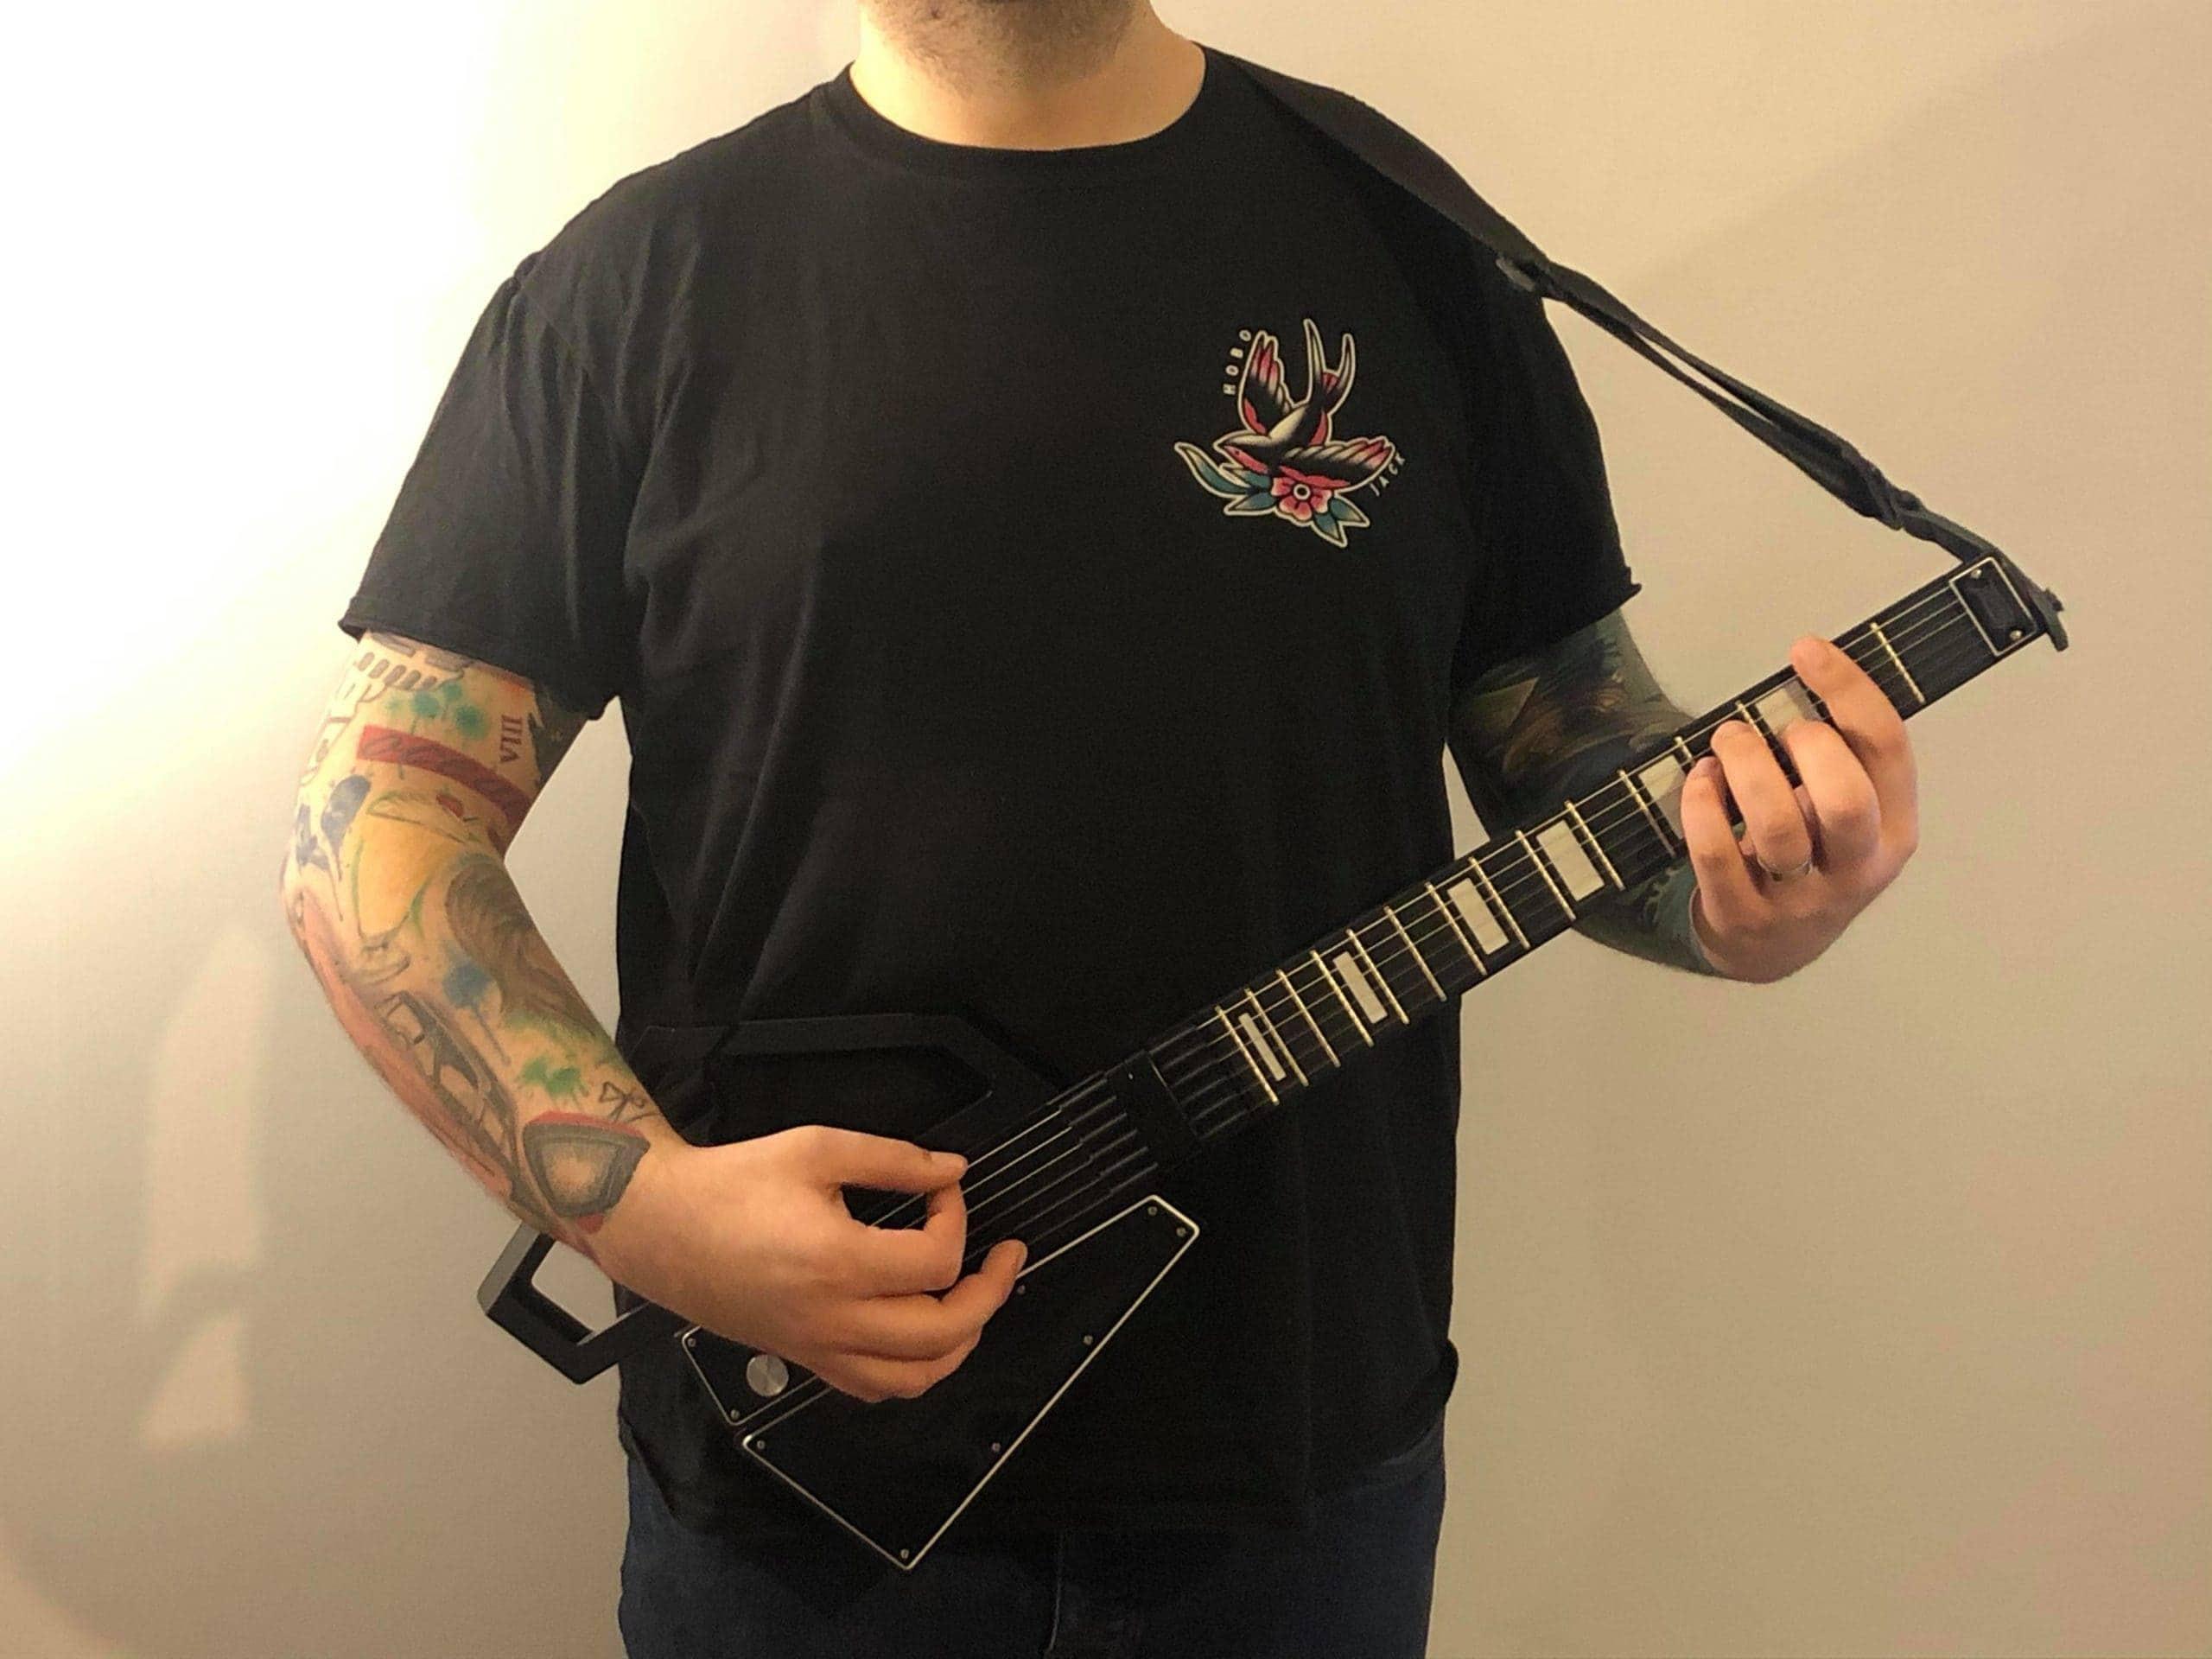 Jammy MIDI Guitar Honest Review (+Discount Code Inside)